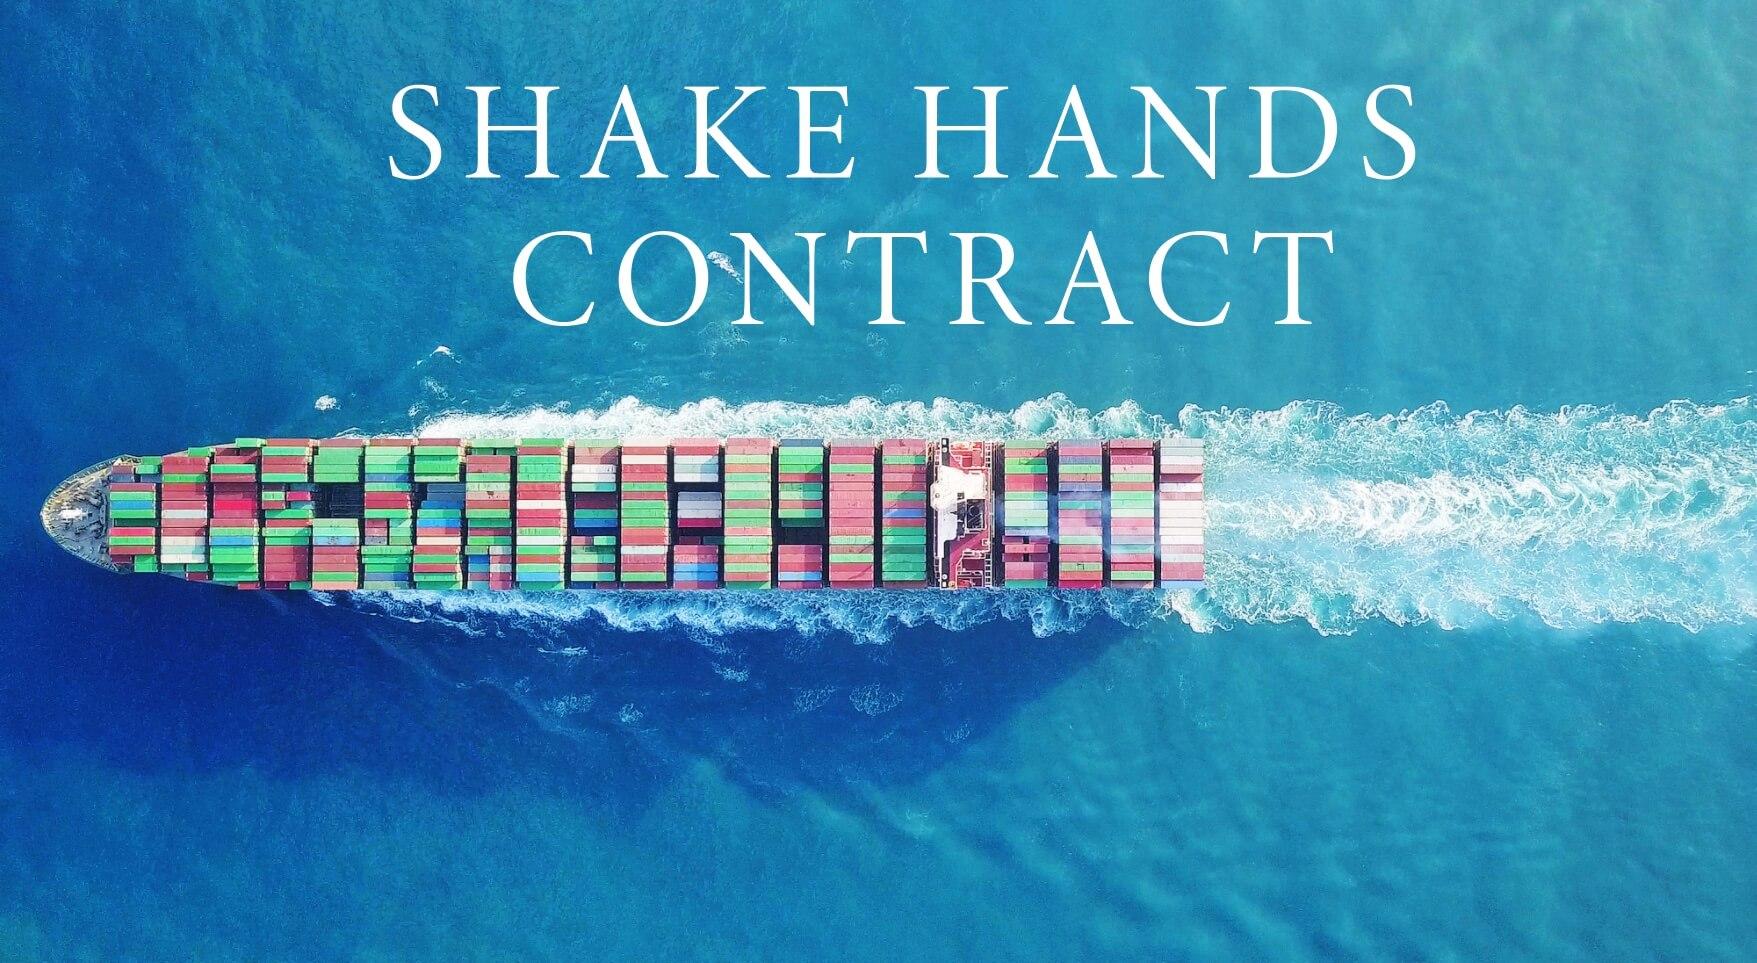 Shake Hands Contract